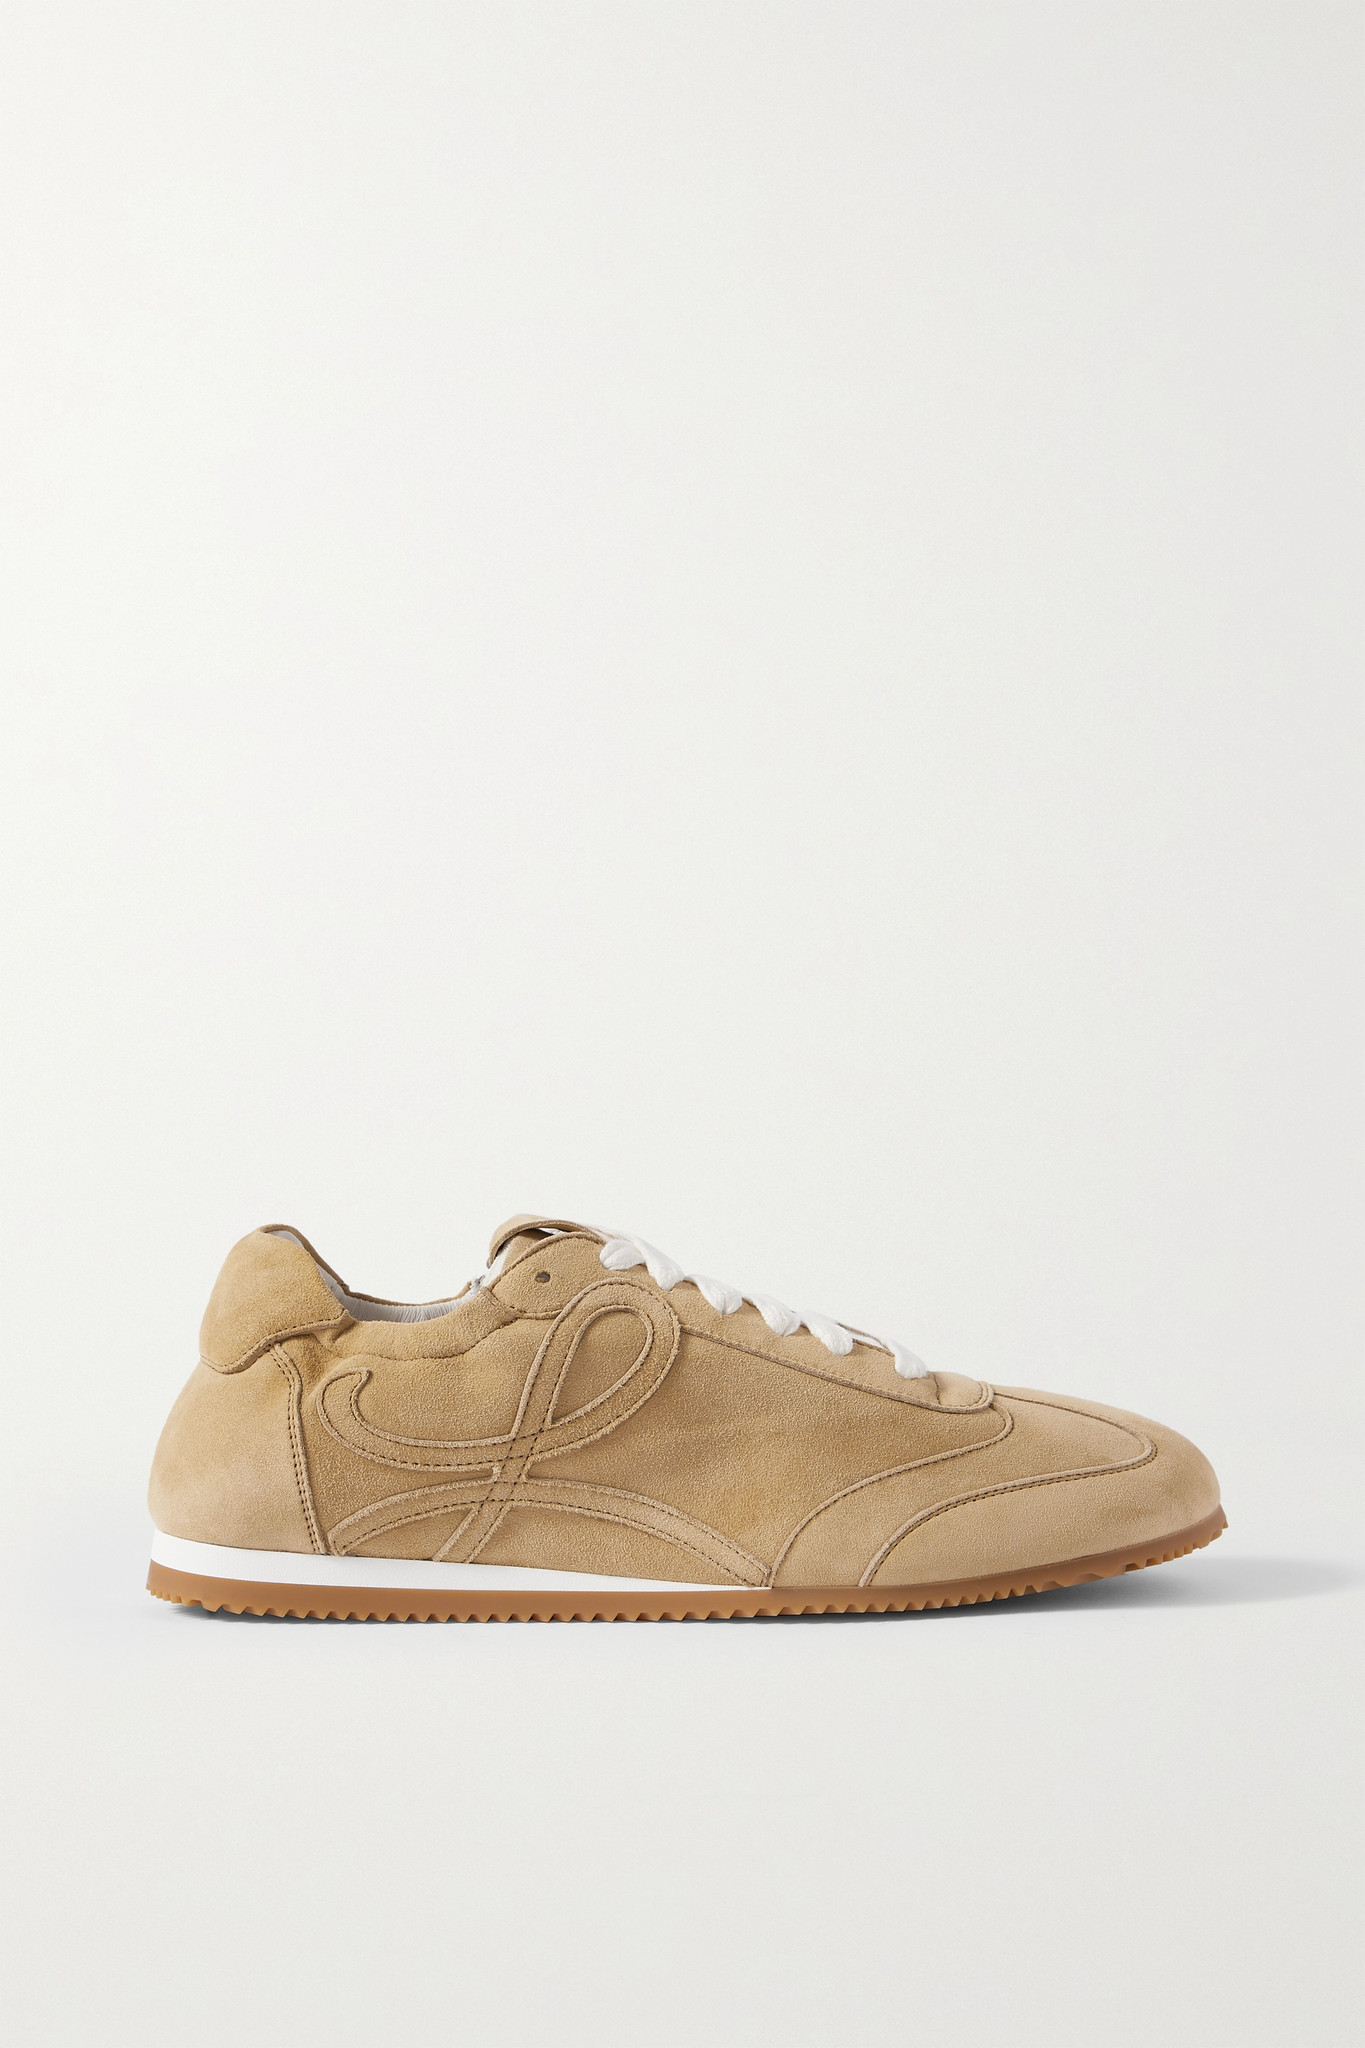 LOEWE - Ballet Suede Sneakers - Neutrals - IT37